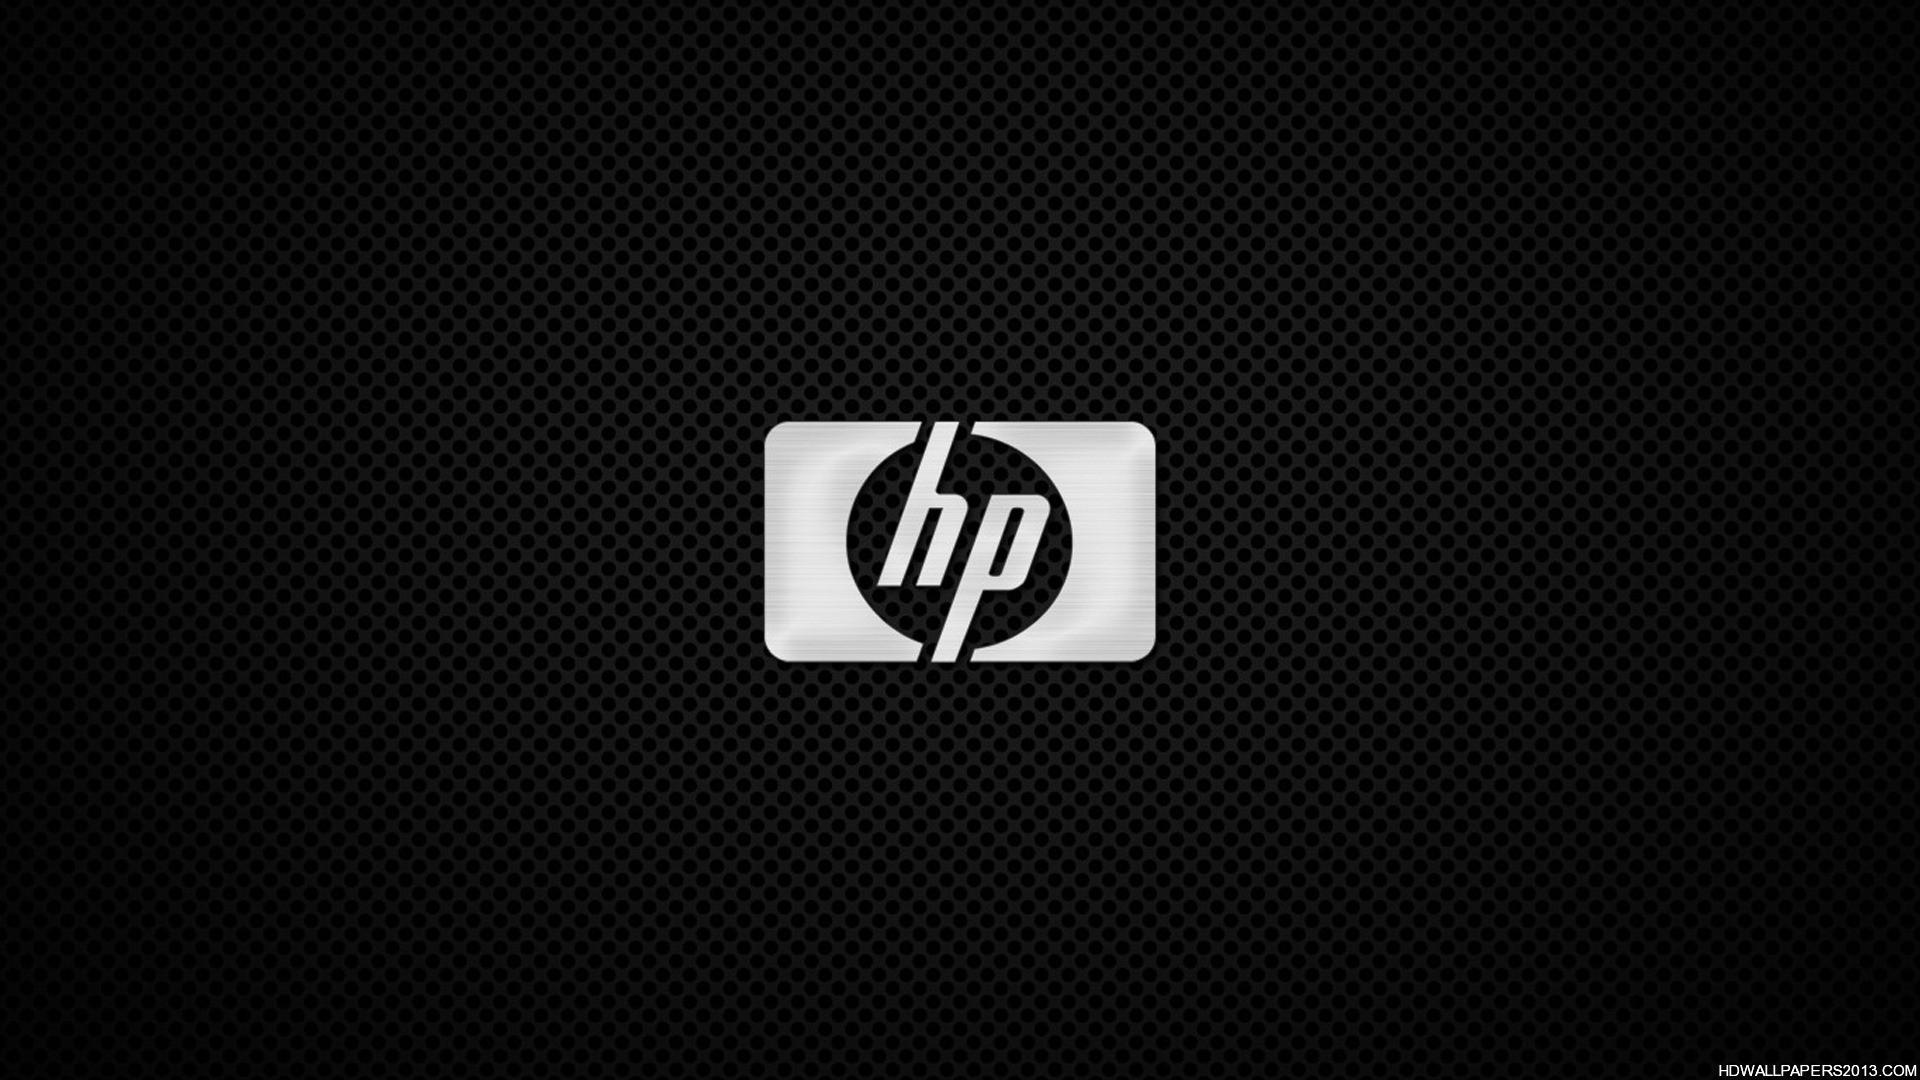 hp wallpaper for laptop hd wallpapers hp wallpaper for laptop hd 1920x1080